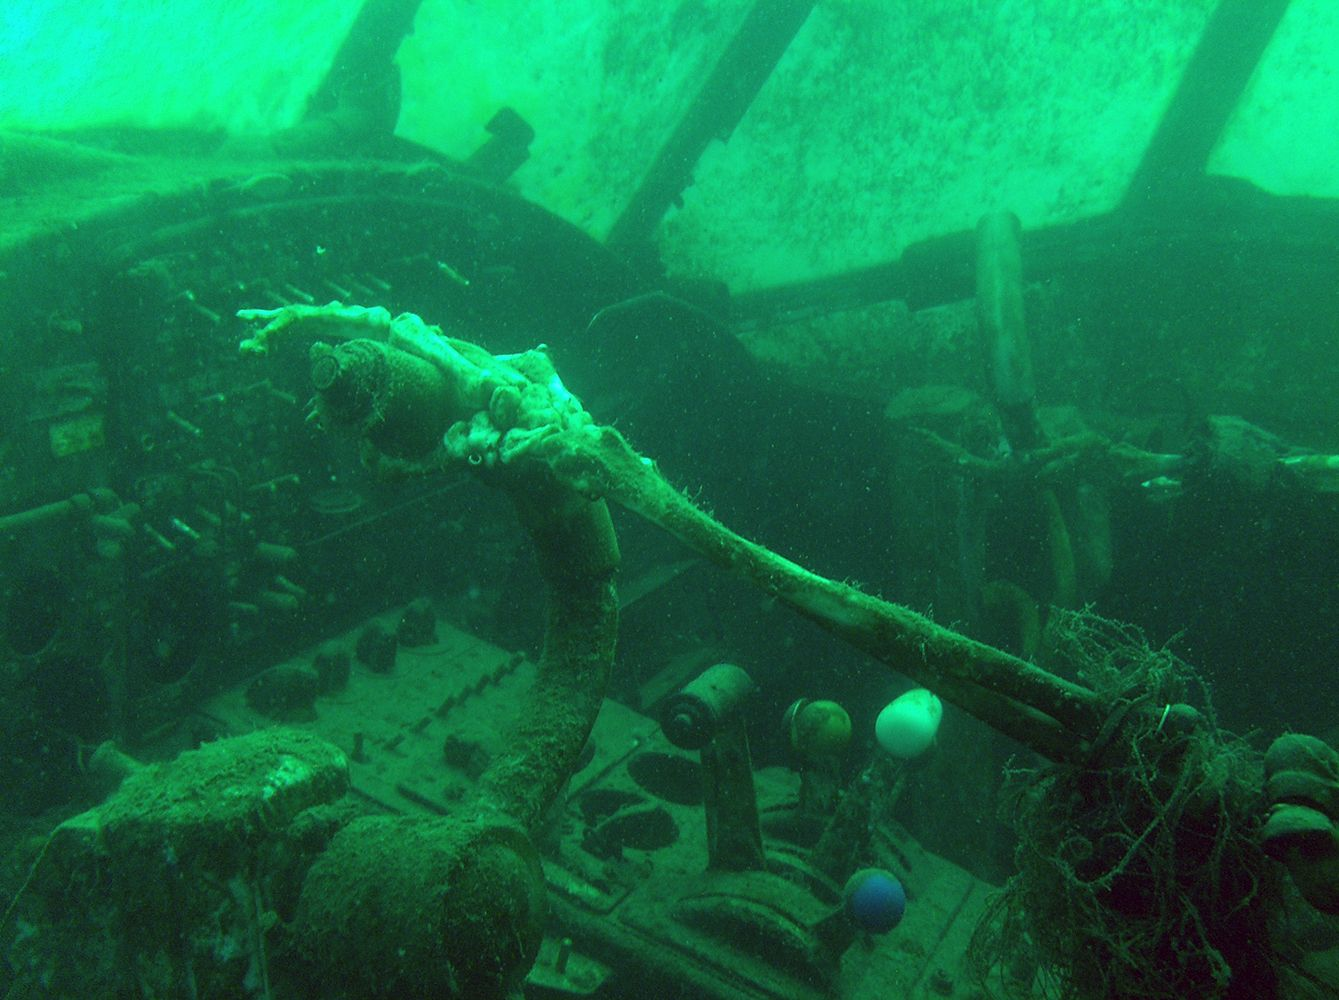 �koparki� jaworzno pl underwater plane wreck podwodny